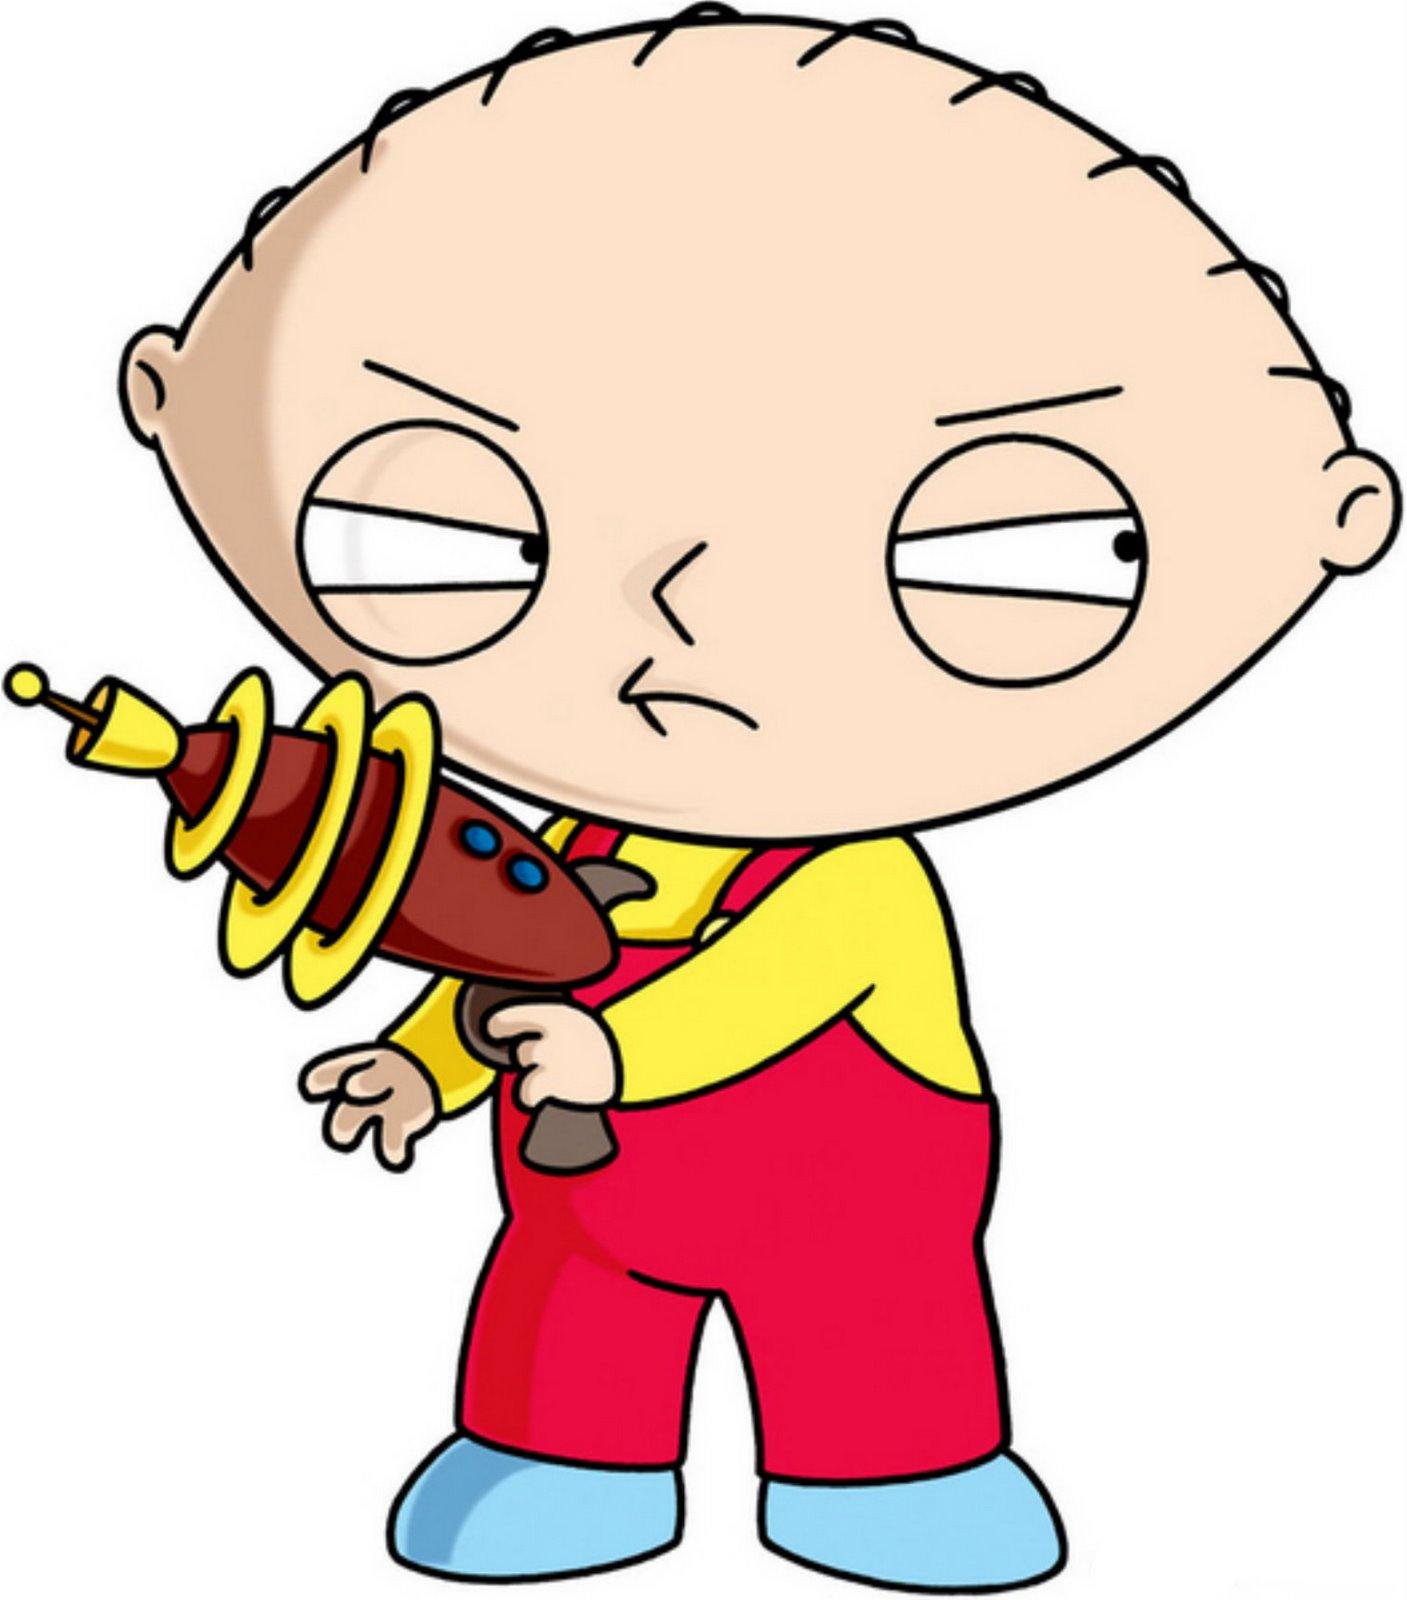 http://1.bp.blogspot.com/_GnEn1NwOca4/SWY859zZLEI/AAAAAAAAALE/Q6boMvcOdks/s1600/Stewie+opposite.JPG